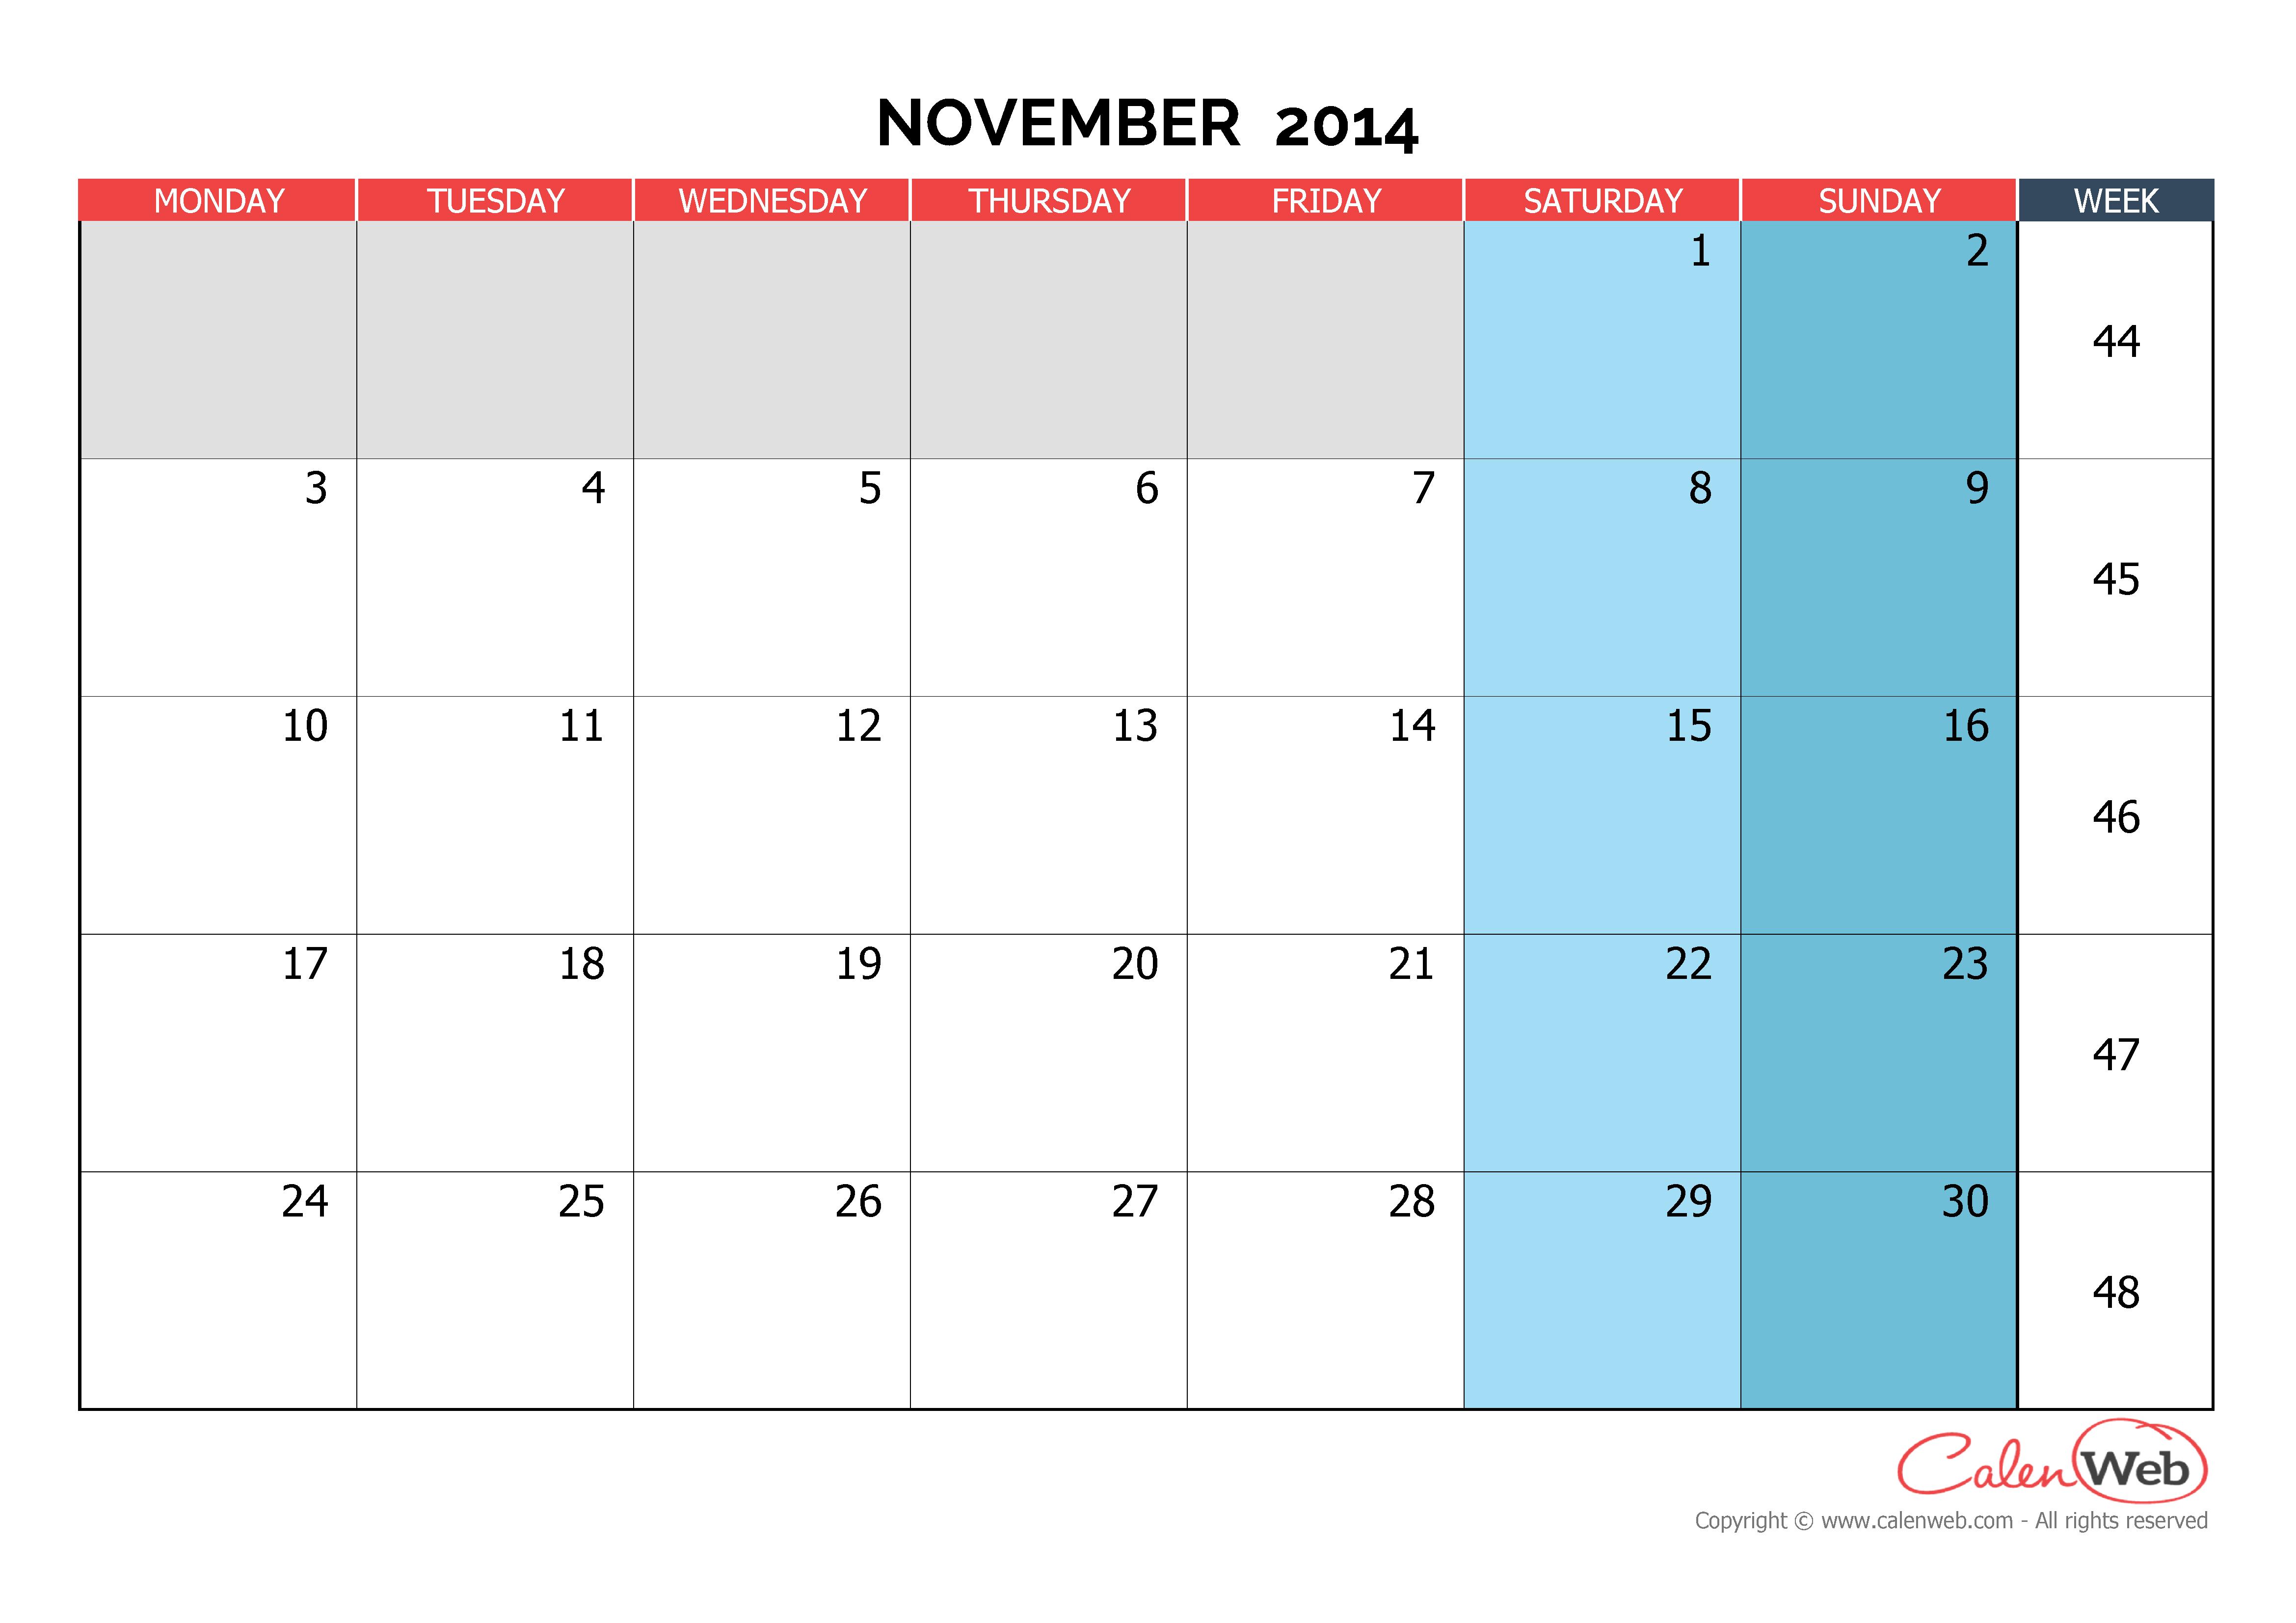 Monthly Calendar Planner November : Monthly calendar month of november the week starts